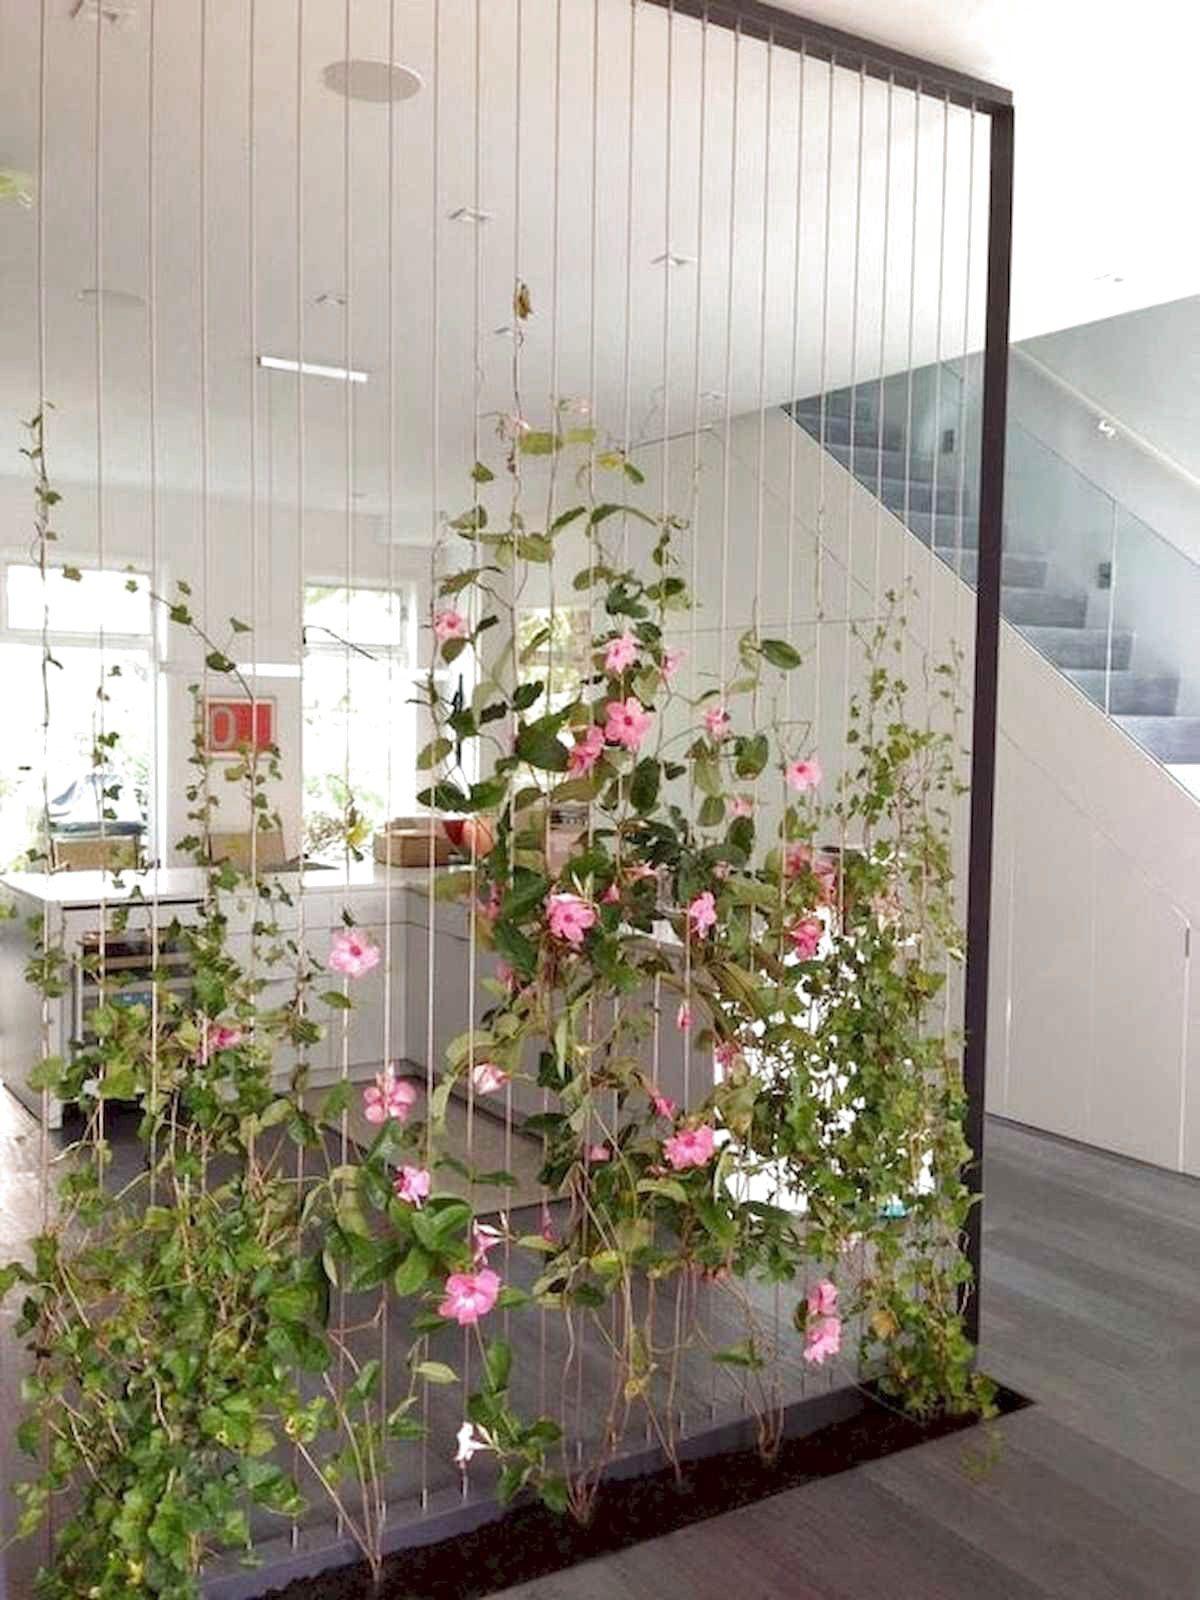 45 Best Indoor Garden For Apartment Design Ideas And Remodel The Expert Beautiful Ideas Vertical Garden Design Vertical Garden Indoor Vertical Garden Diy